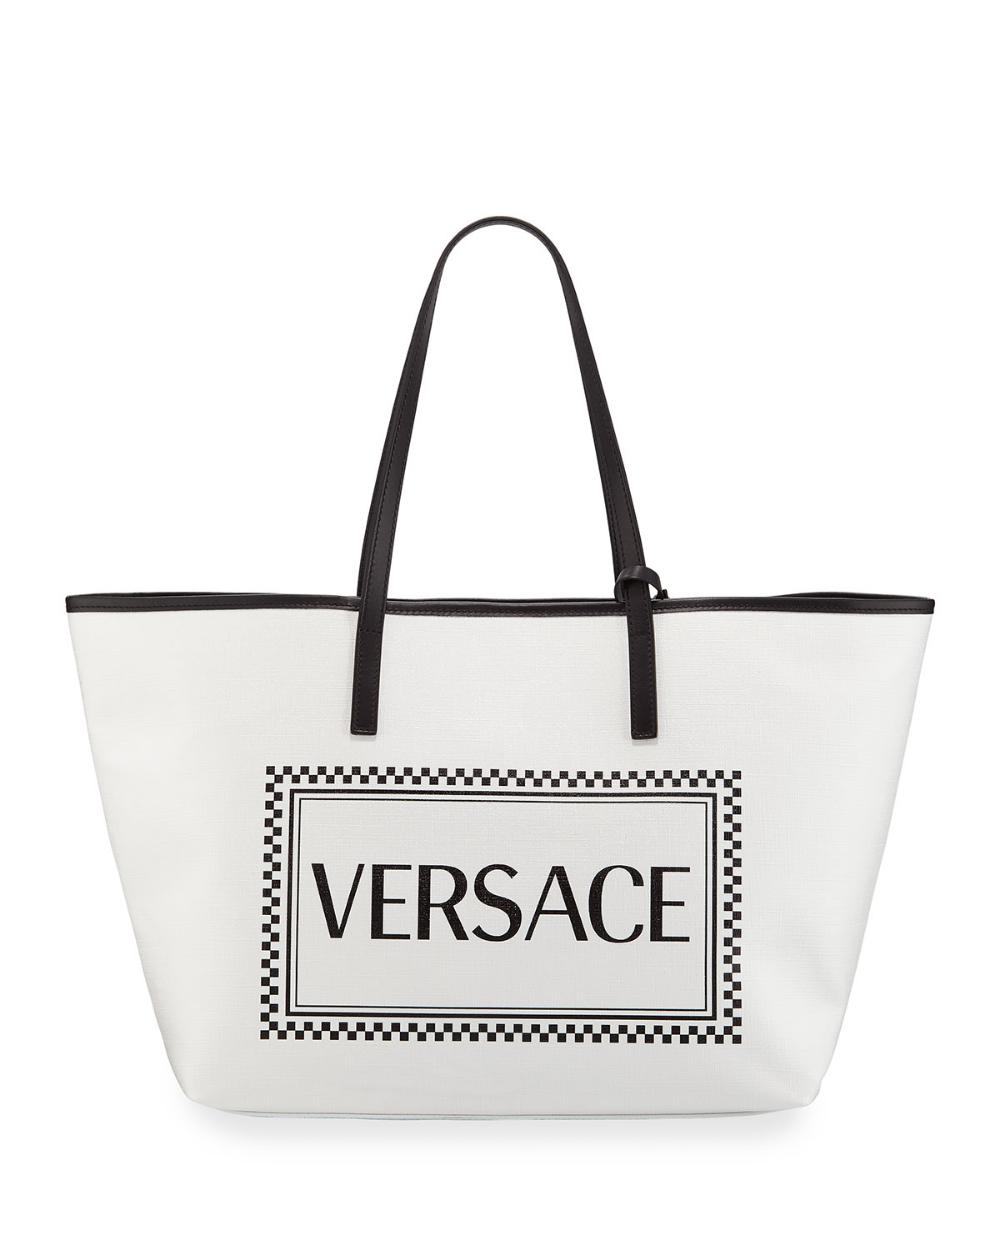 Versace 90s Logo Small Tote Bag Small Tote Bags Small Tote Tote Bag